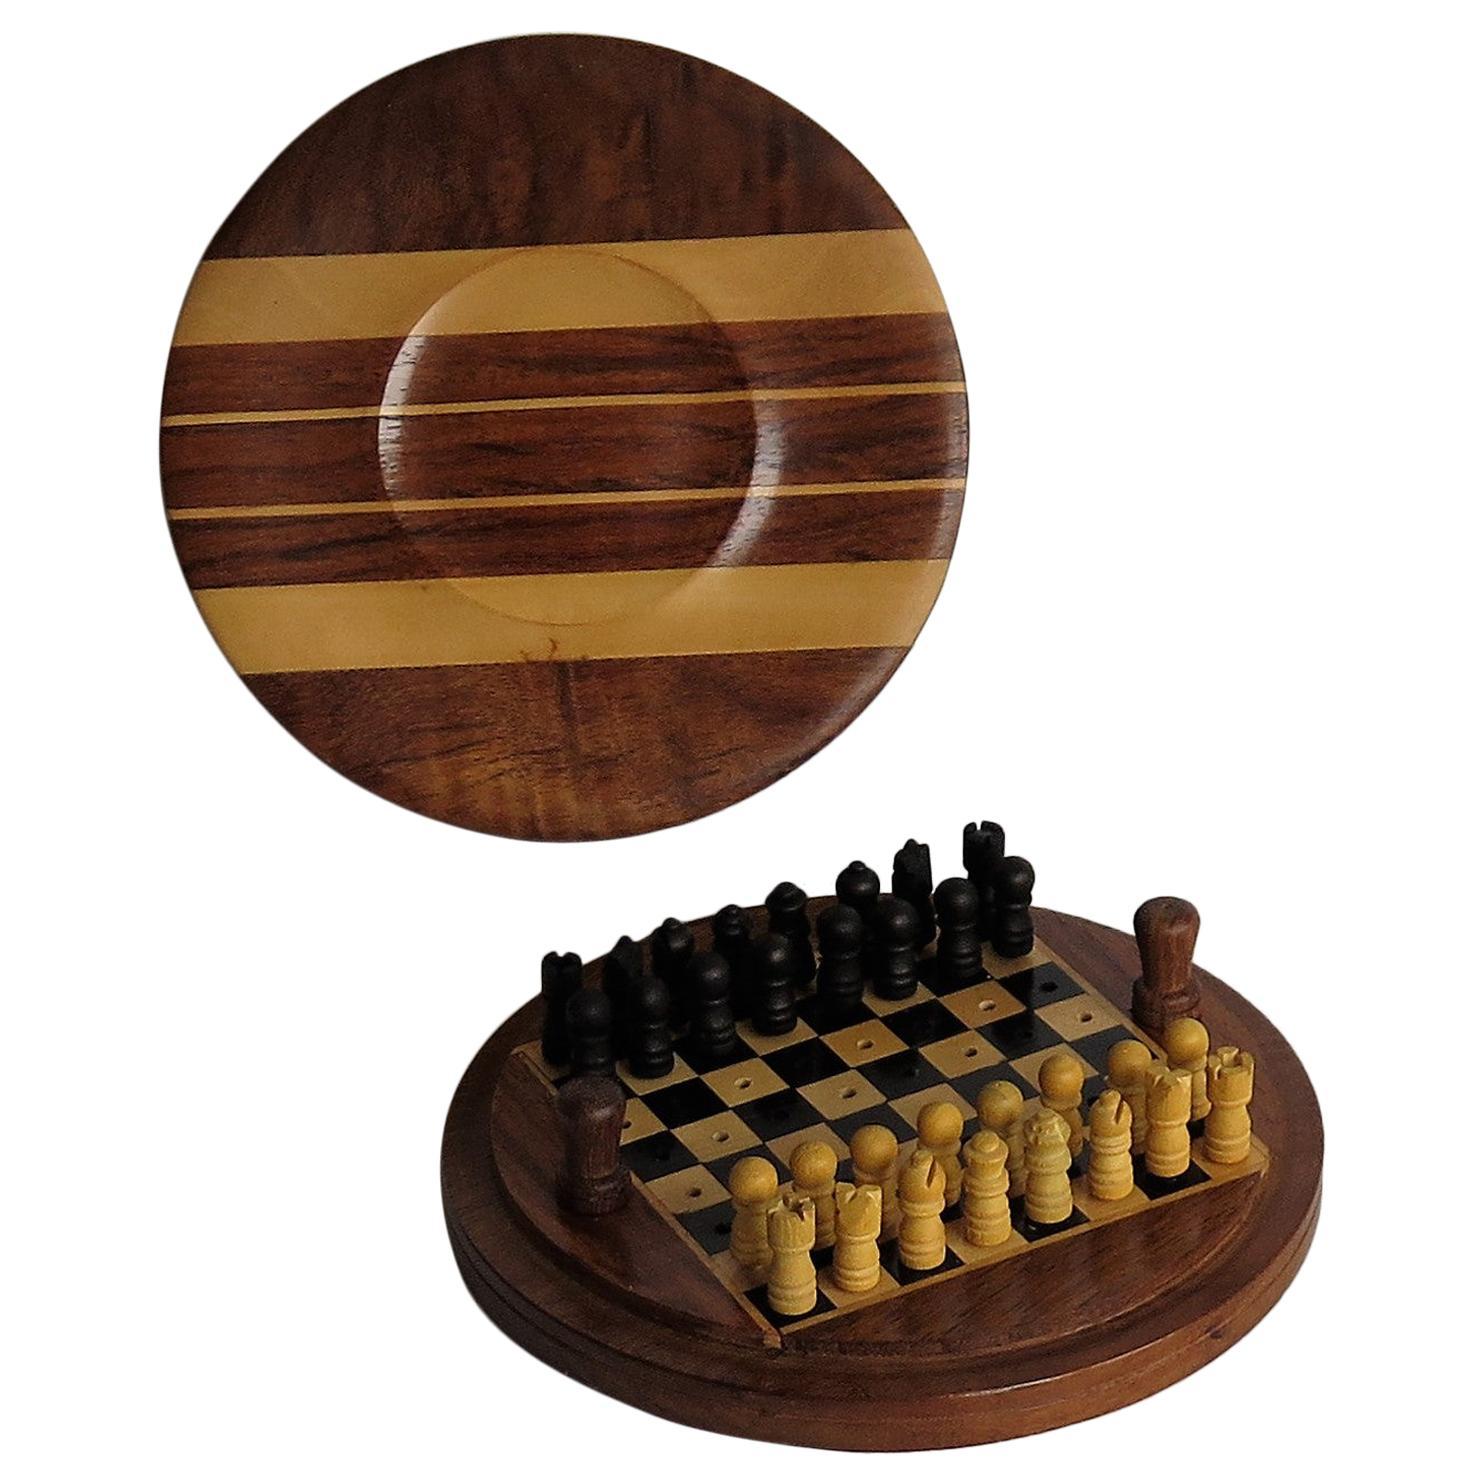 Handmade Miniature Travelling Chess Set Game Inlaid Walnut Box, circa 1920